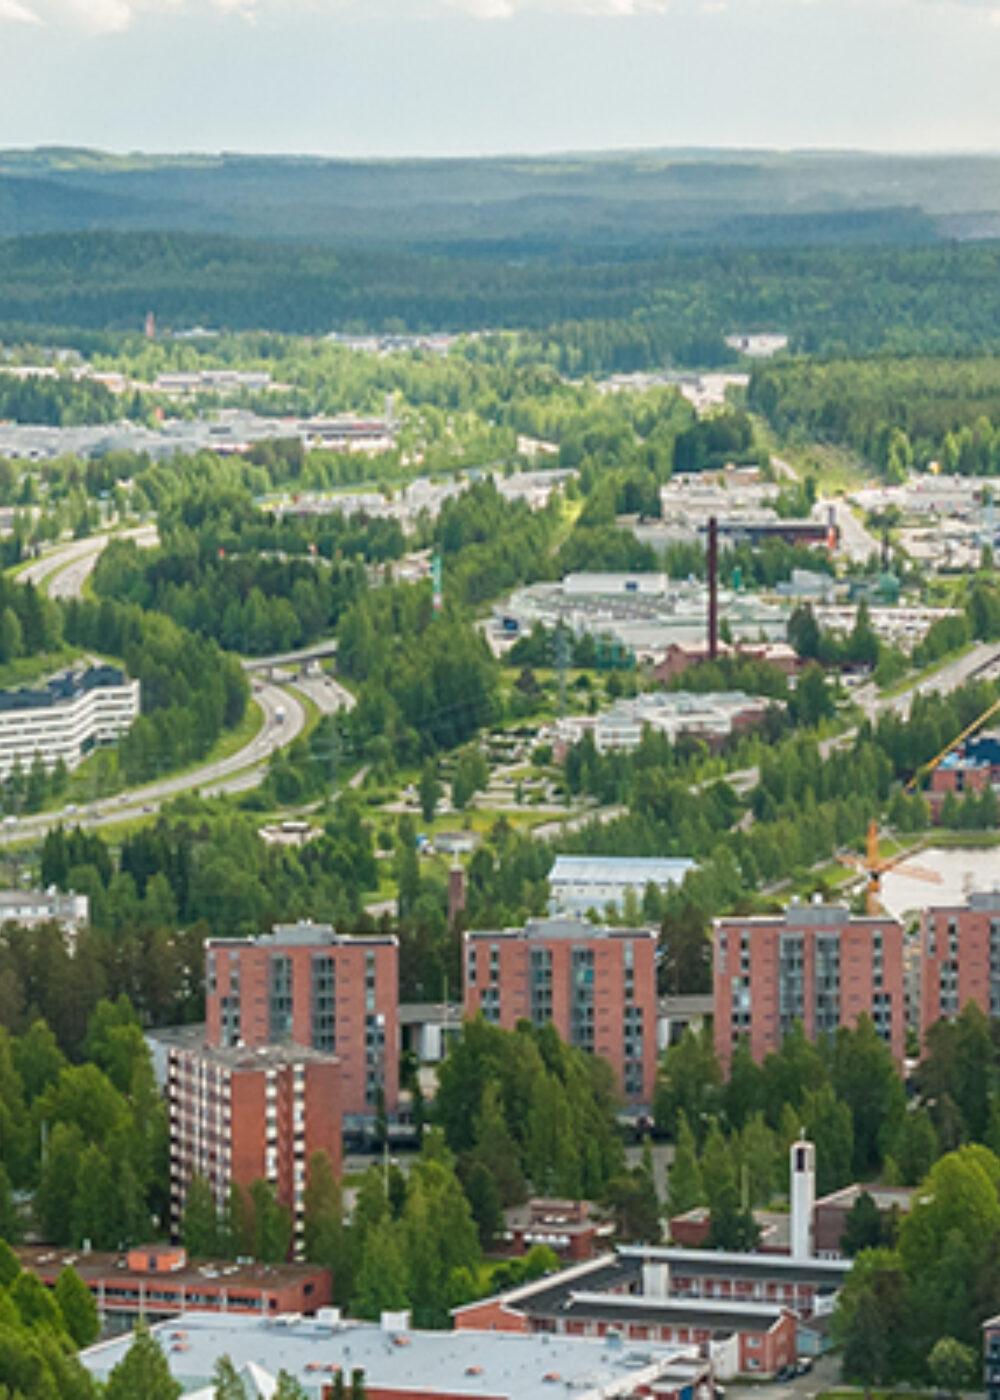 Green Motion Car Rental Finland Kuopio Downtown Hotel Rantasipi Atlas 1440x400